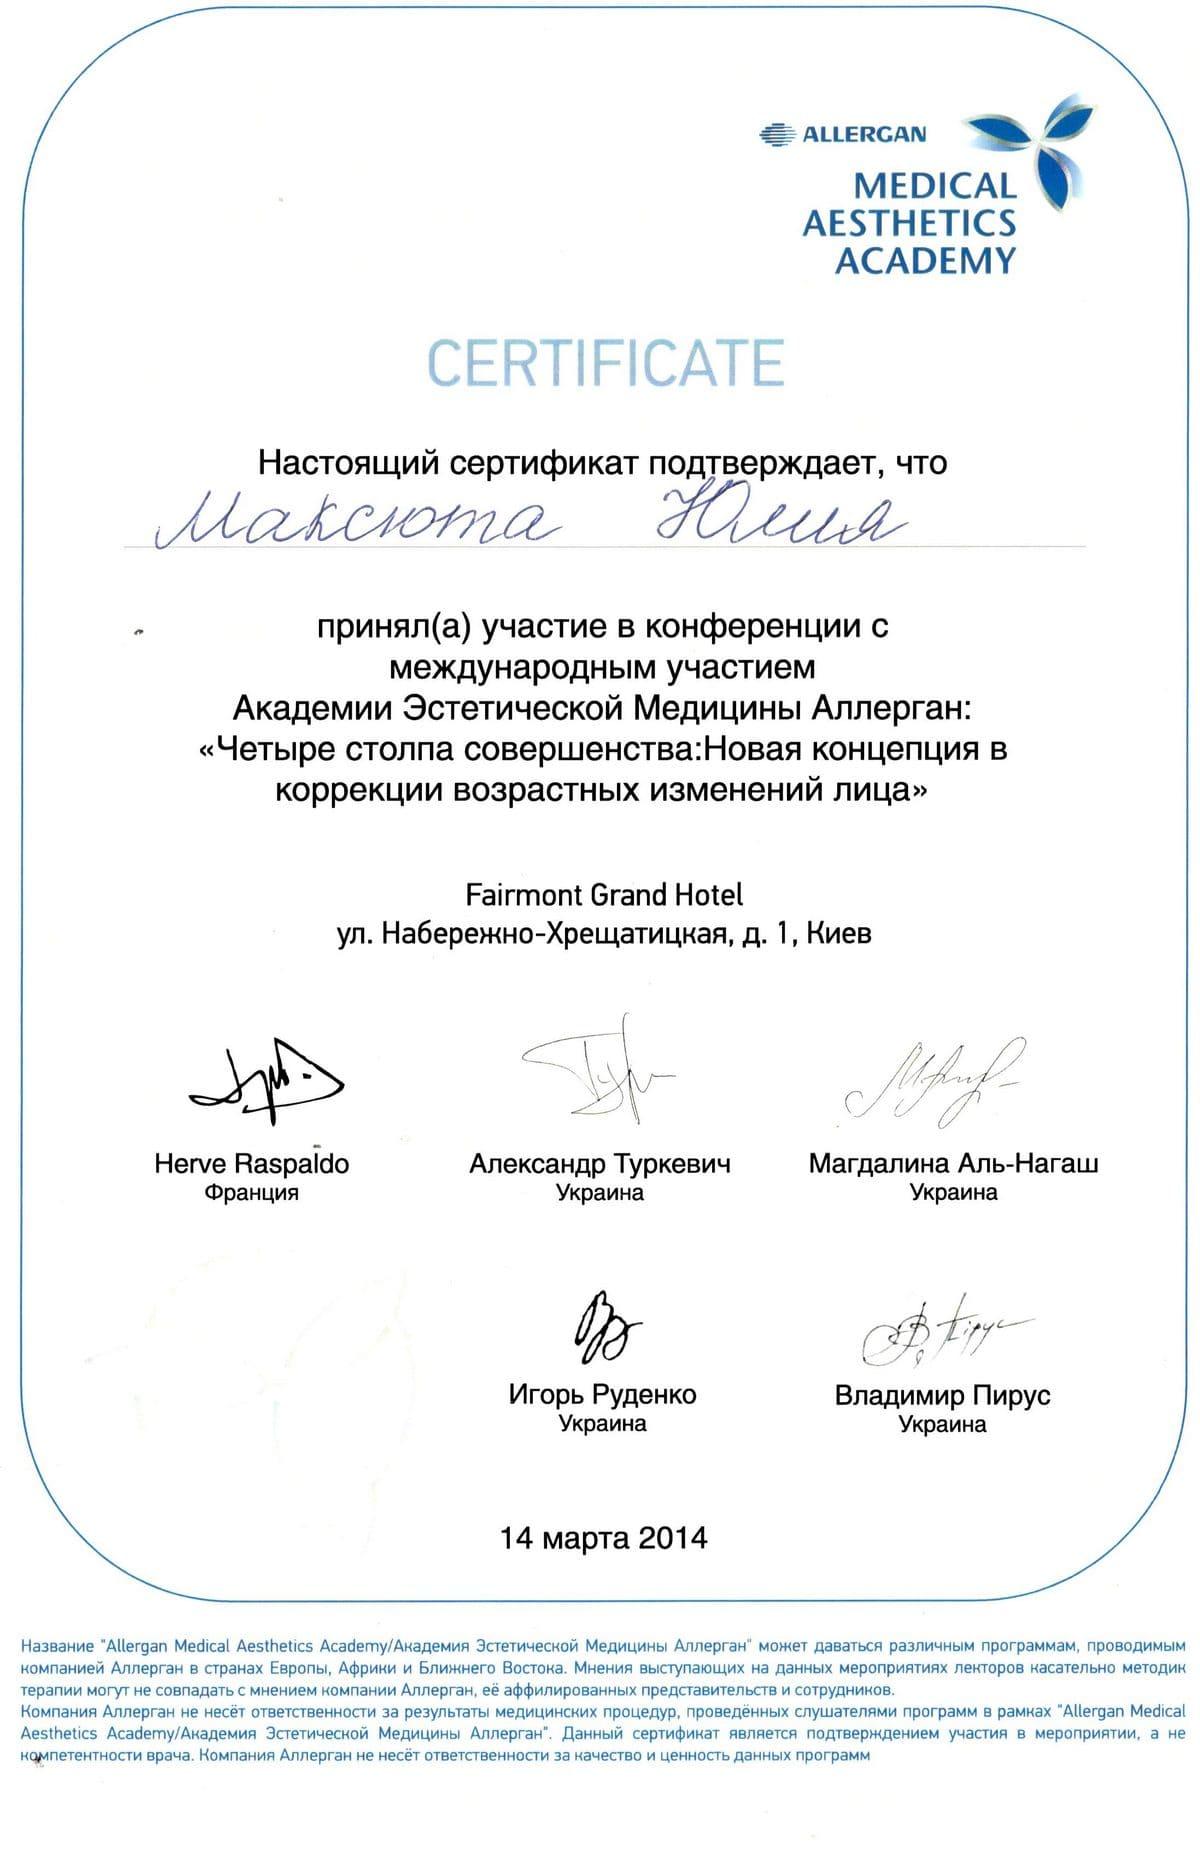 Документ №:9 Сертификат врача-дерматолога, косметолога Максюты Юлии Анатольевны